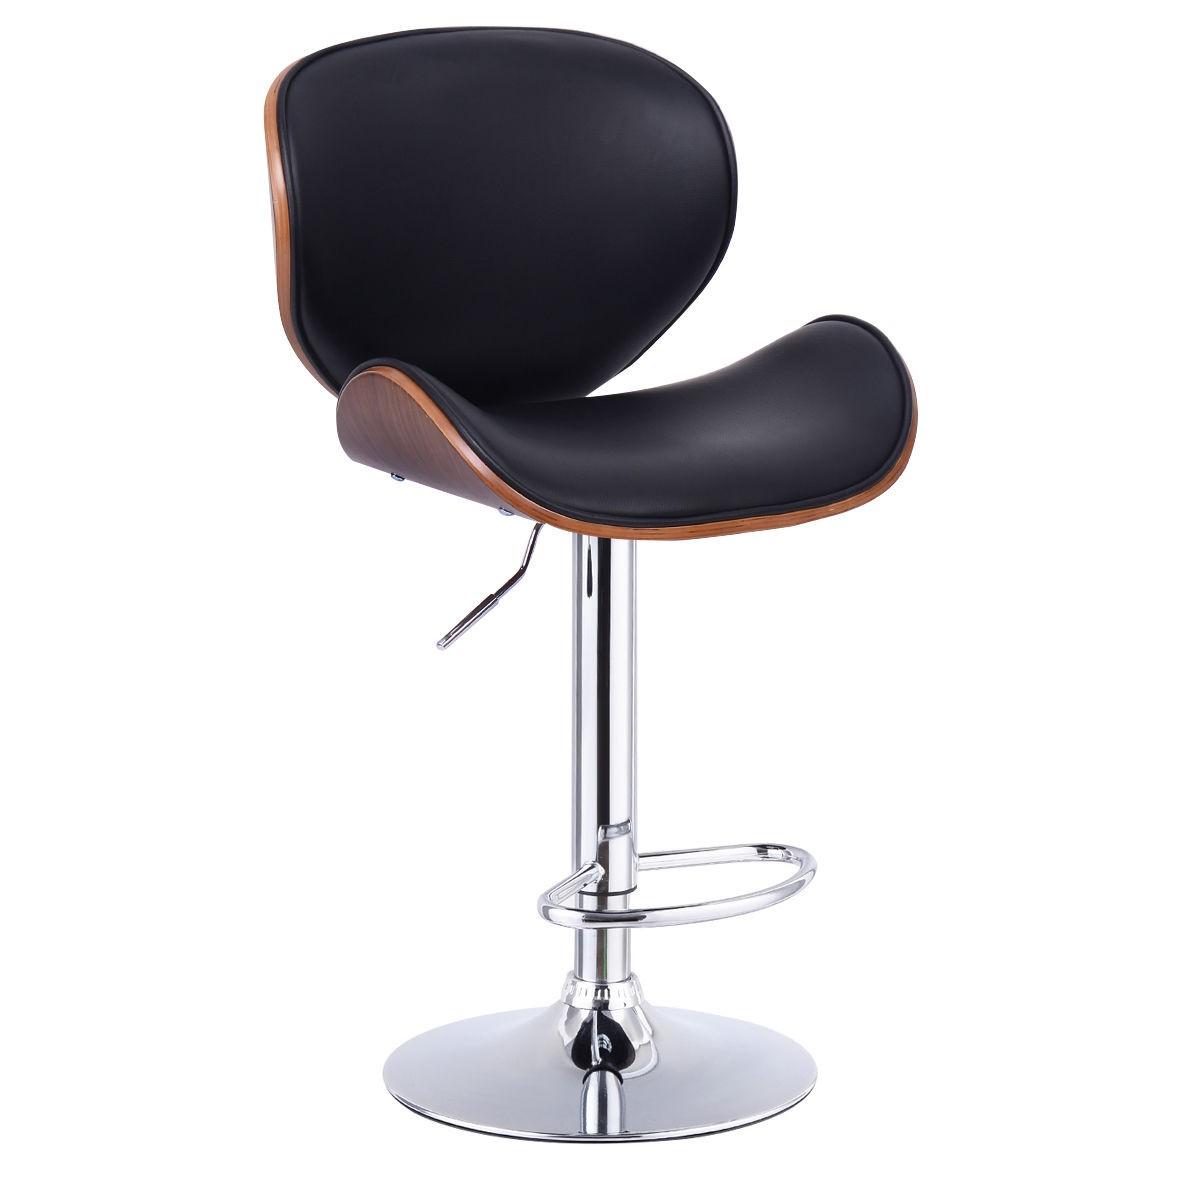 Lh Modern Adjustable Height Swivel Bentwood Cushioned Seat Bar Stool Rest Back Ebay